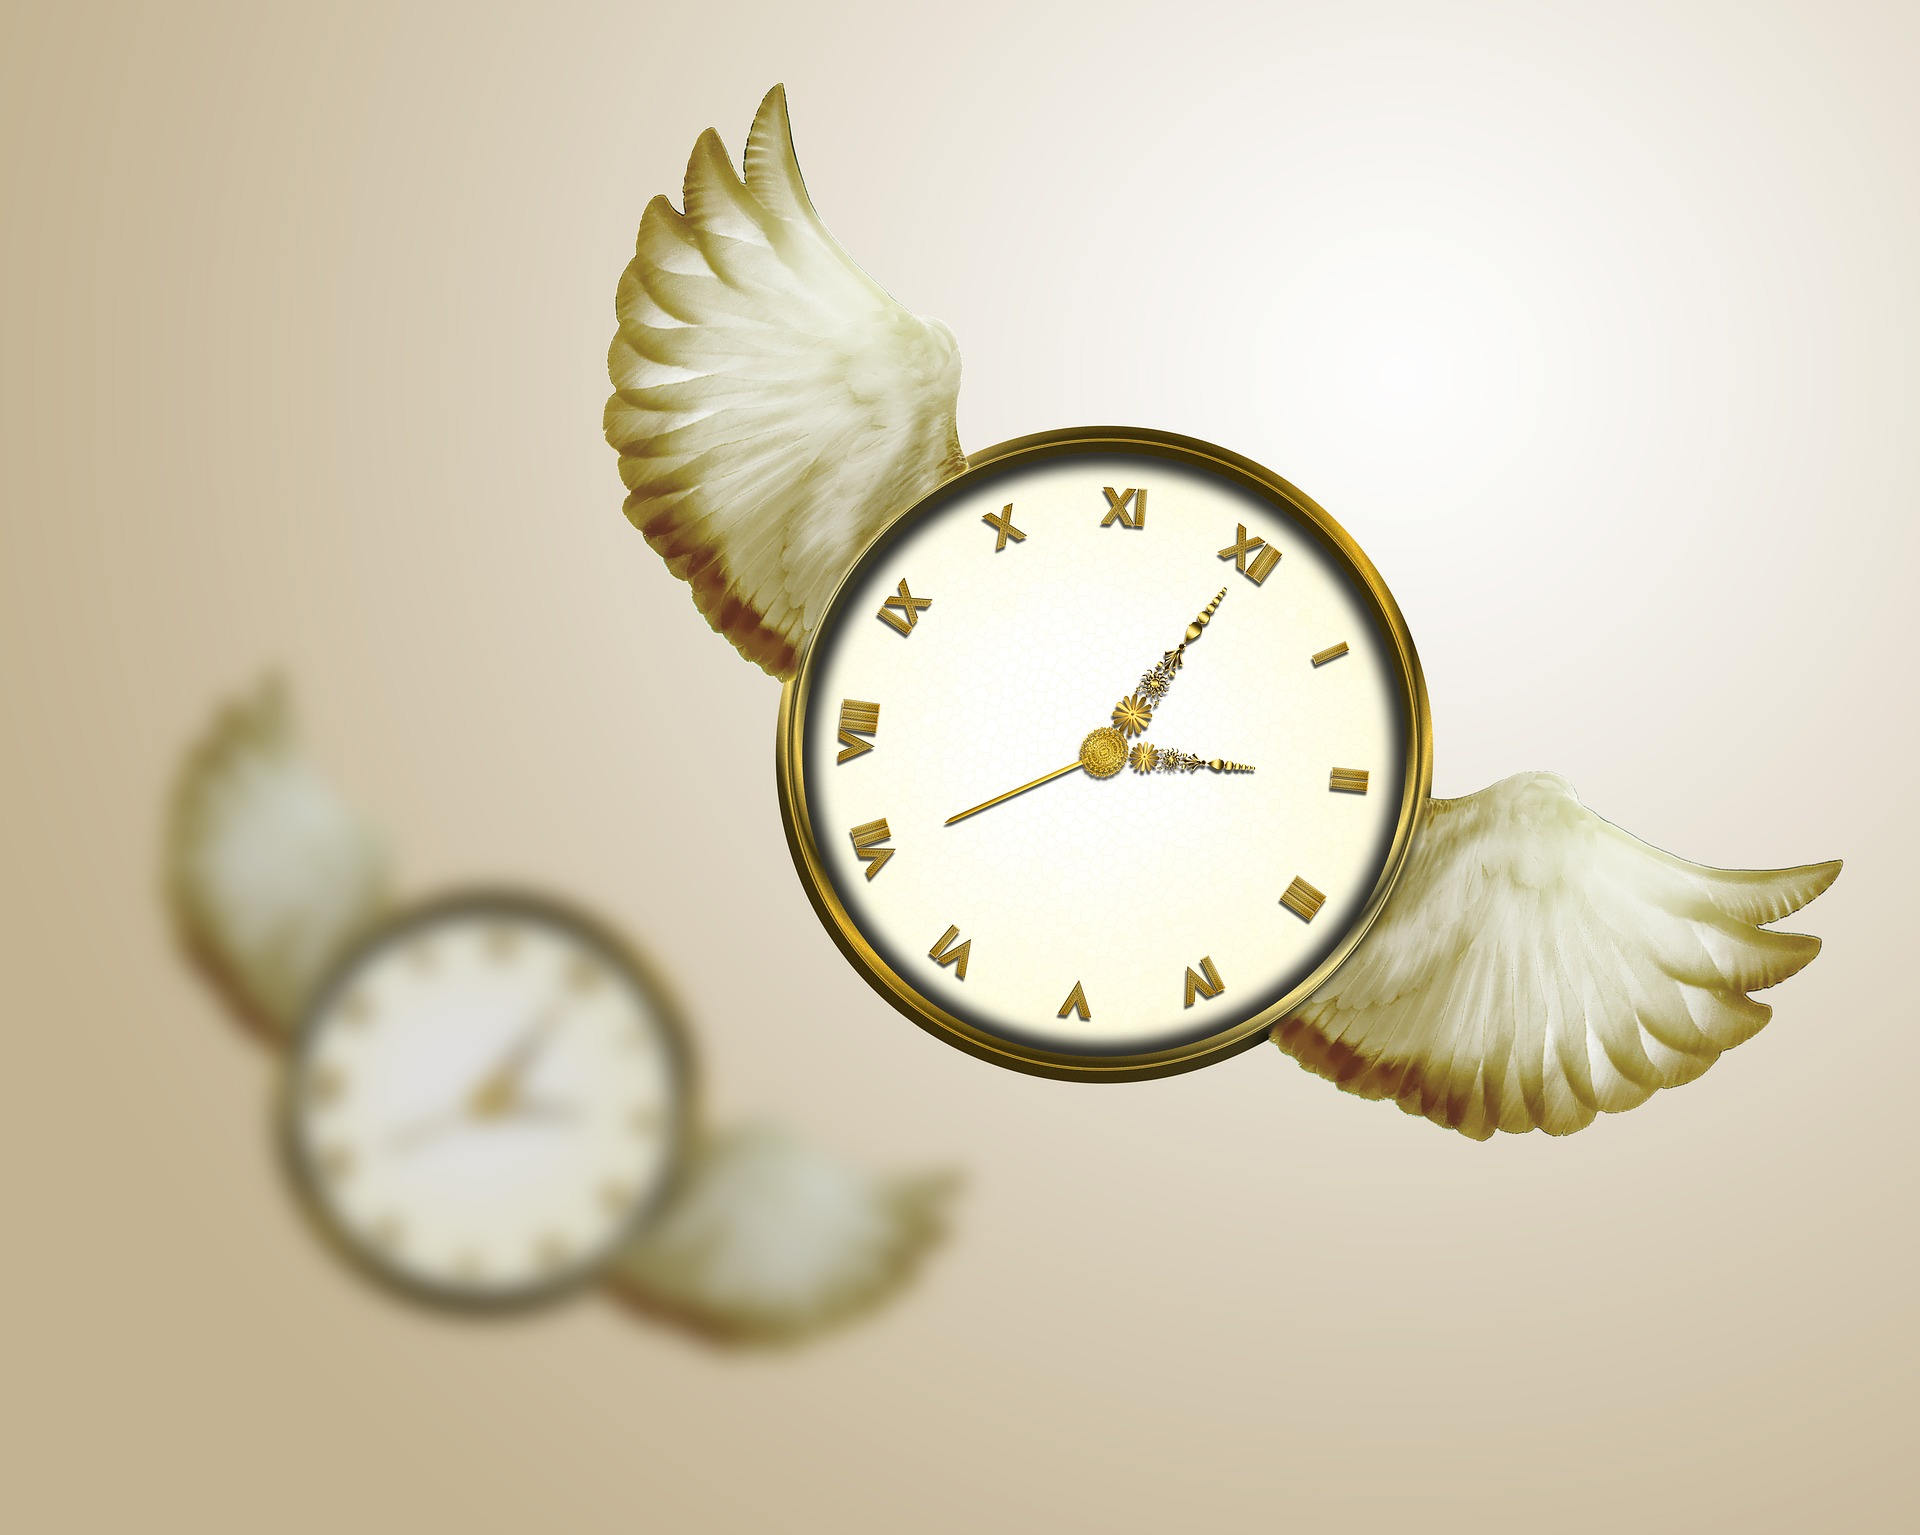 time-flies-2470848_1920